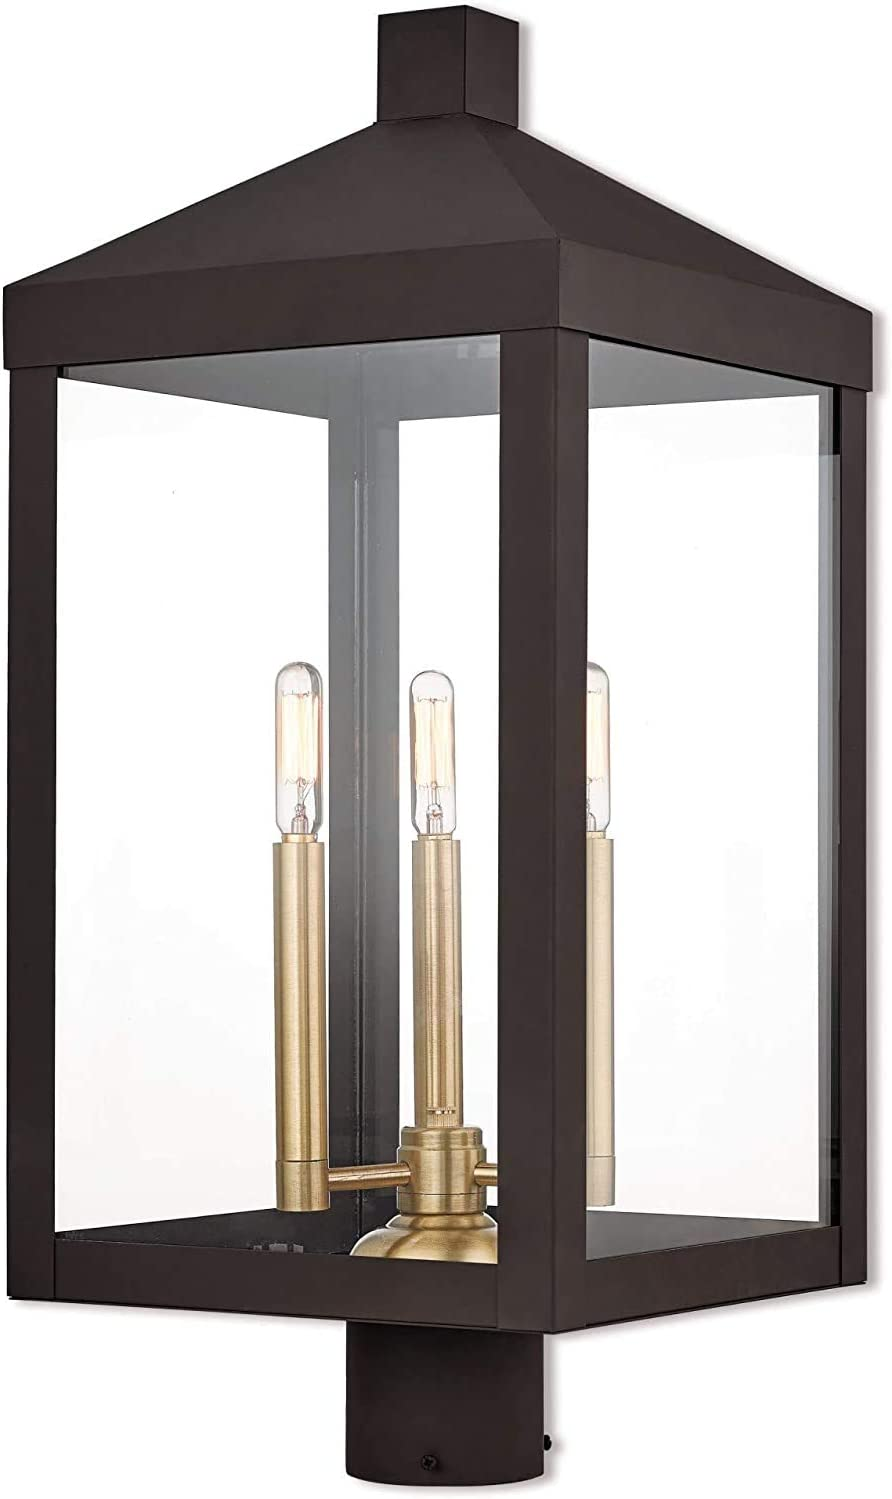 Livex In a popularity Lighting 20586-07 Bronze Lantern Max 47% OFF